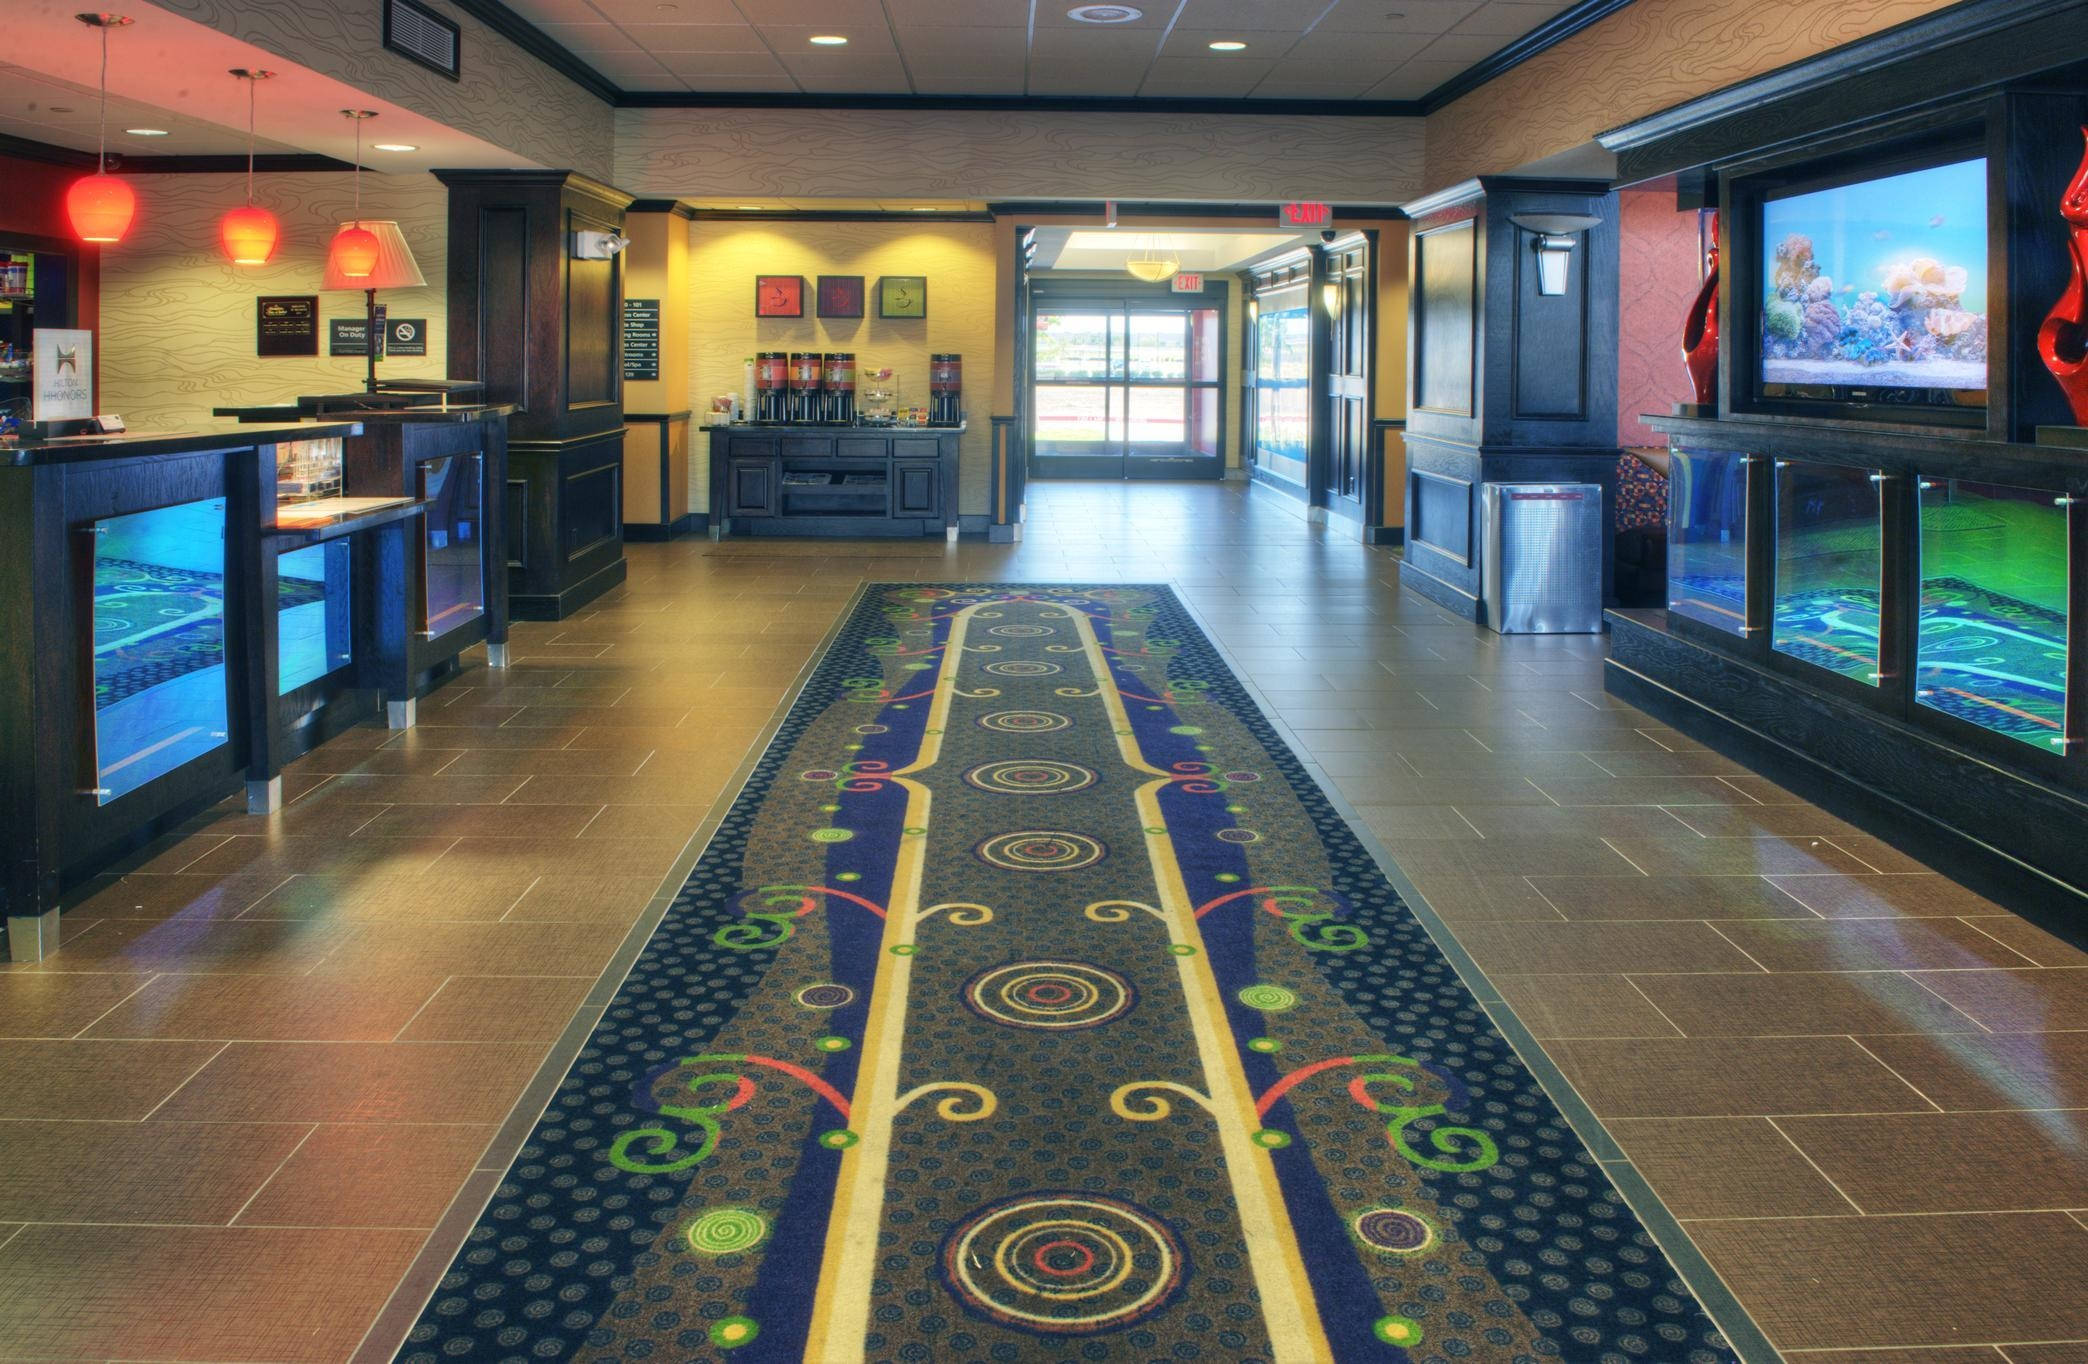 Hampton Inn & Suites Dallas/Lewisville-Vista Ridge Mall, TX image 5